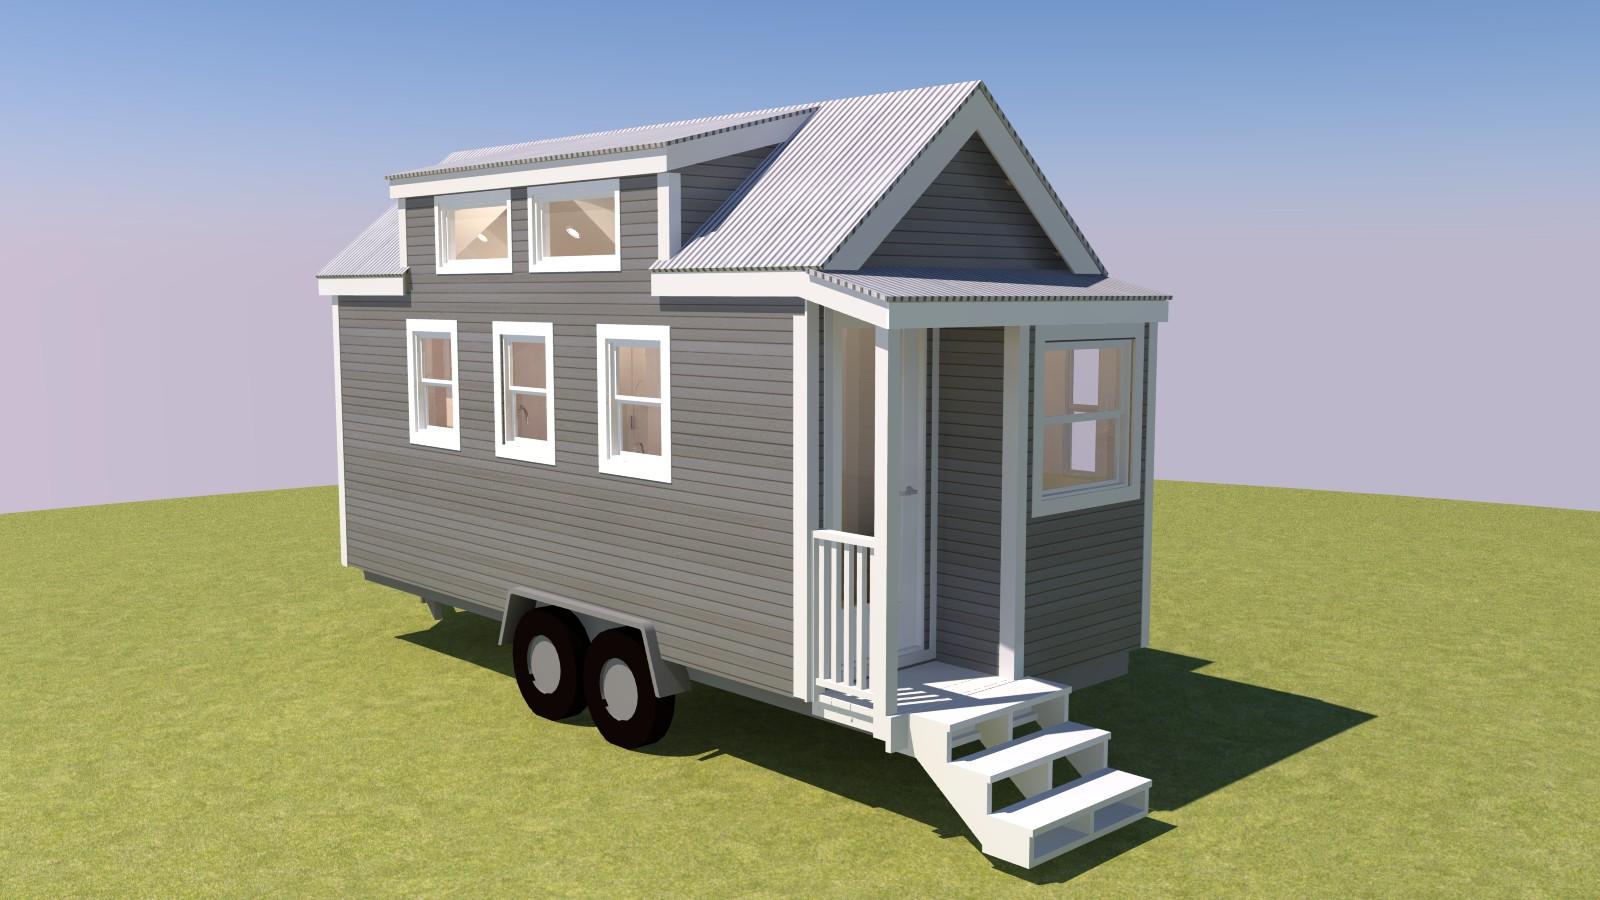 4 New 3D Tiny House Tour Videos - Tiny House Design